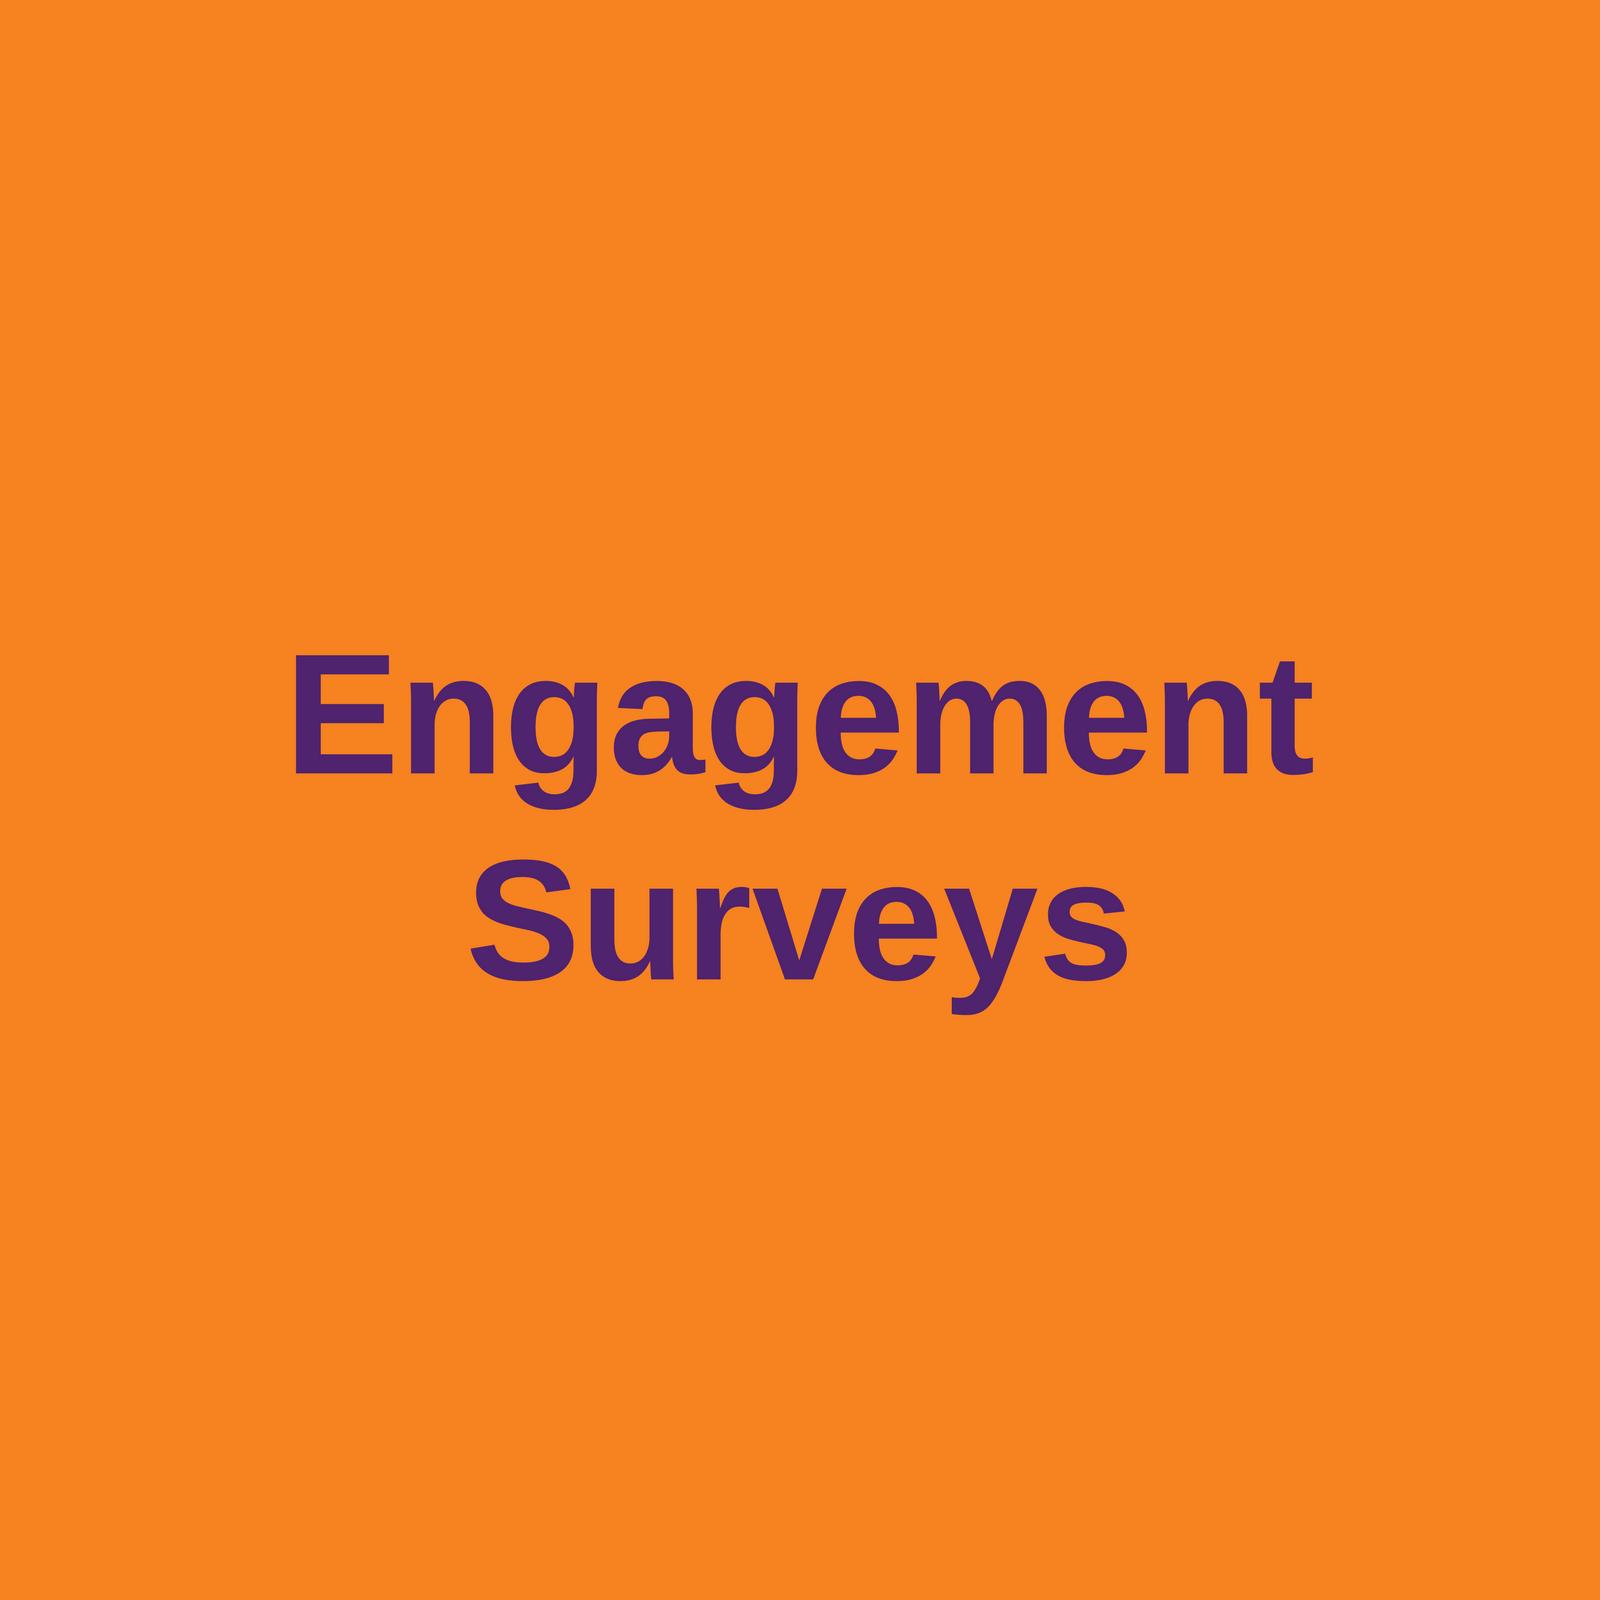 engagement surveys